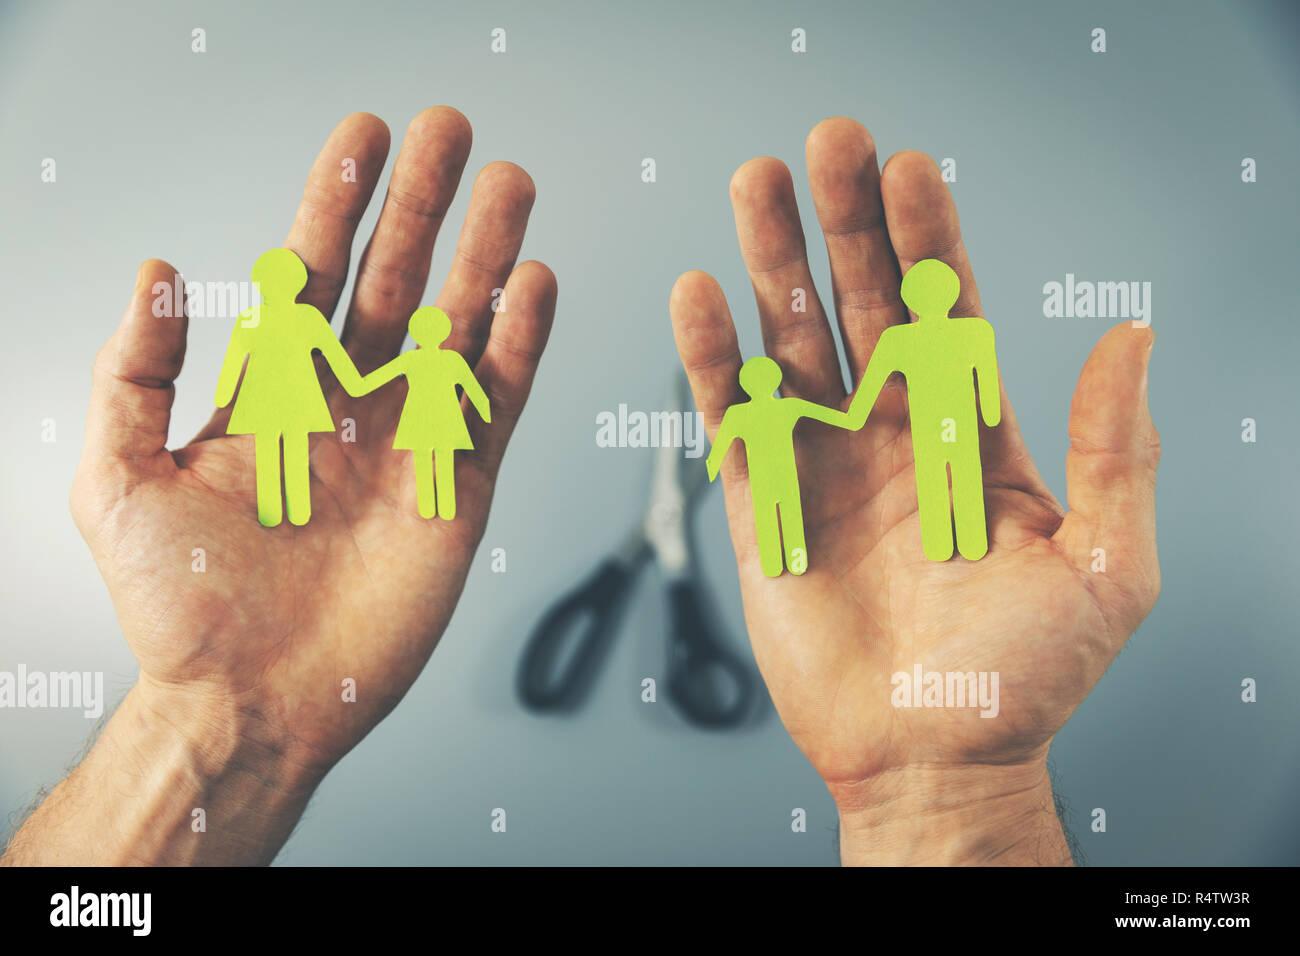 family split after divorce concept - Stock Image